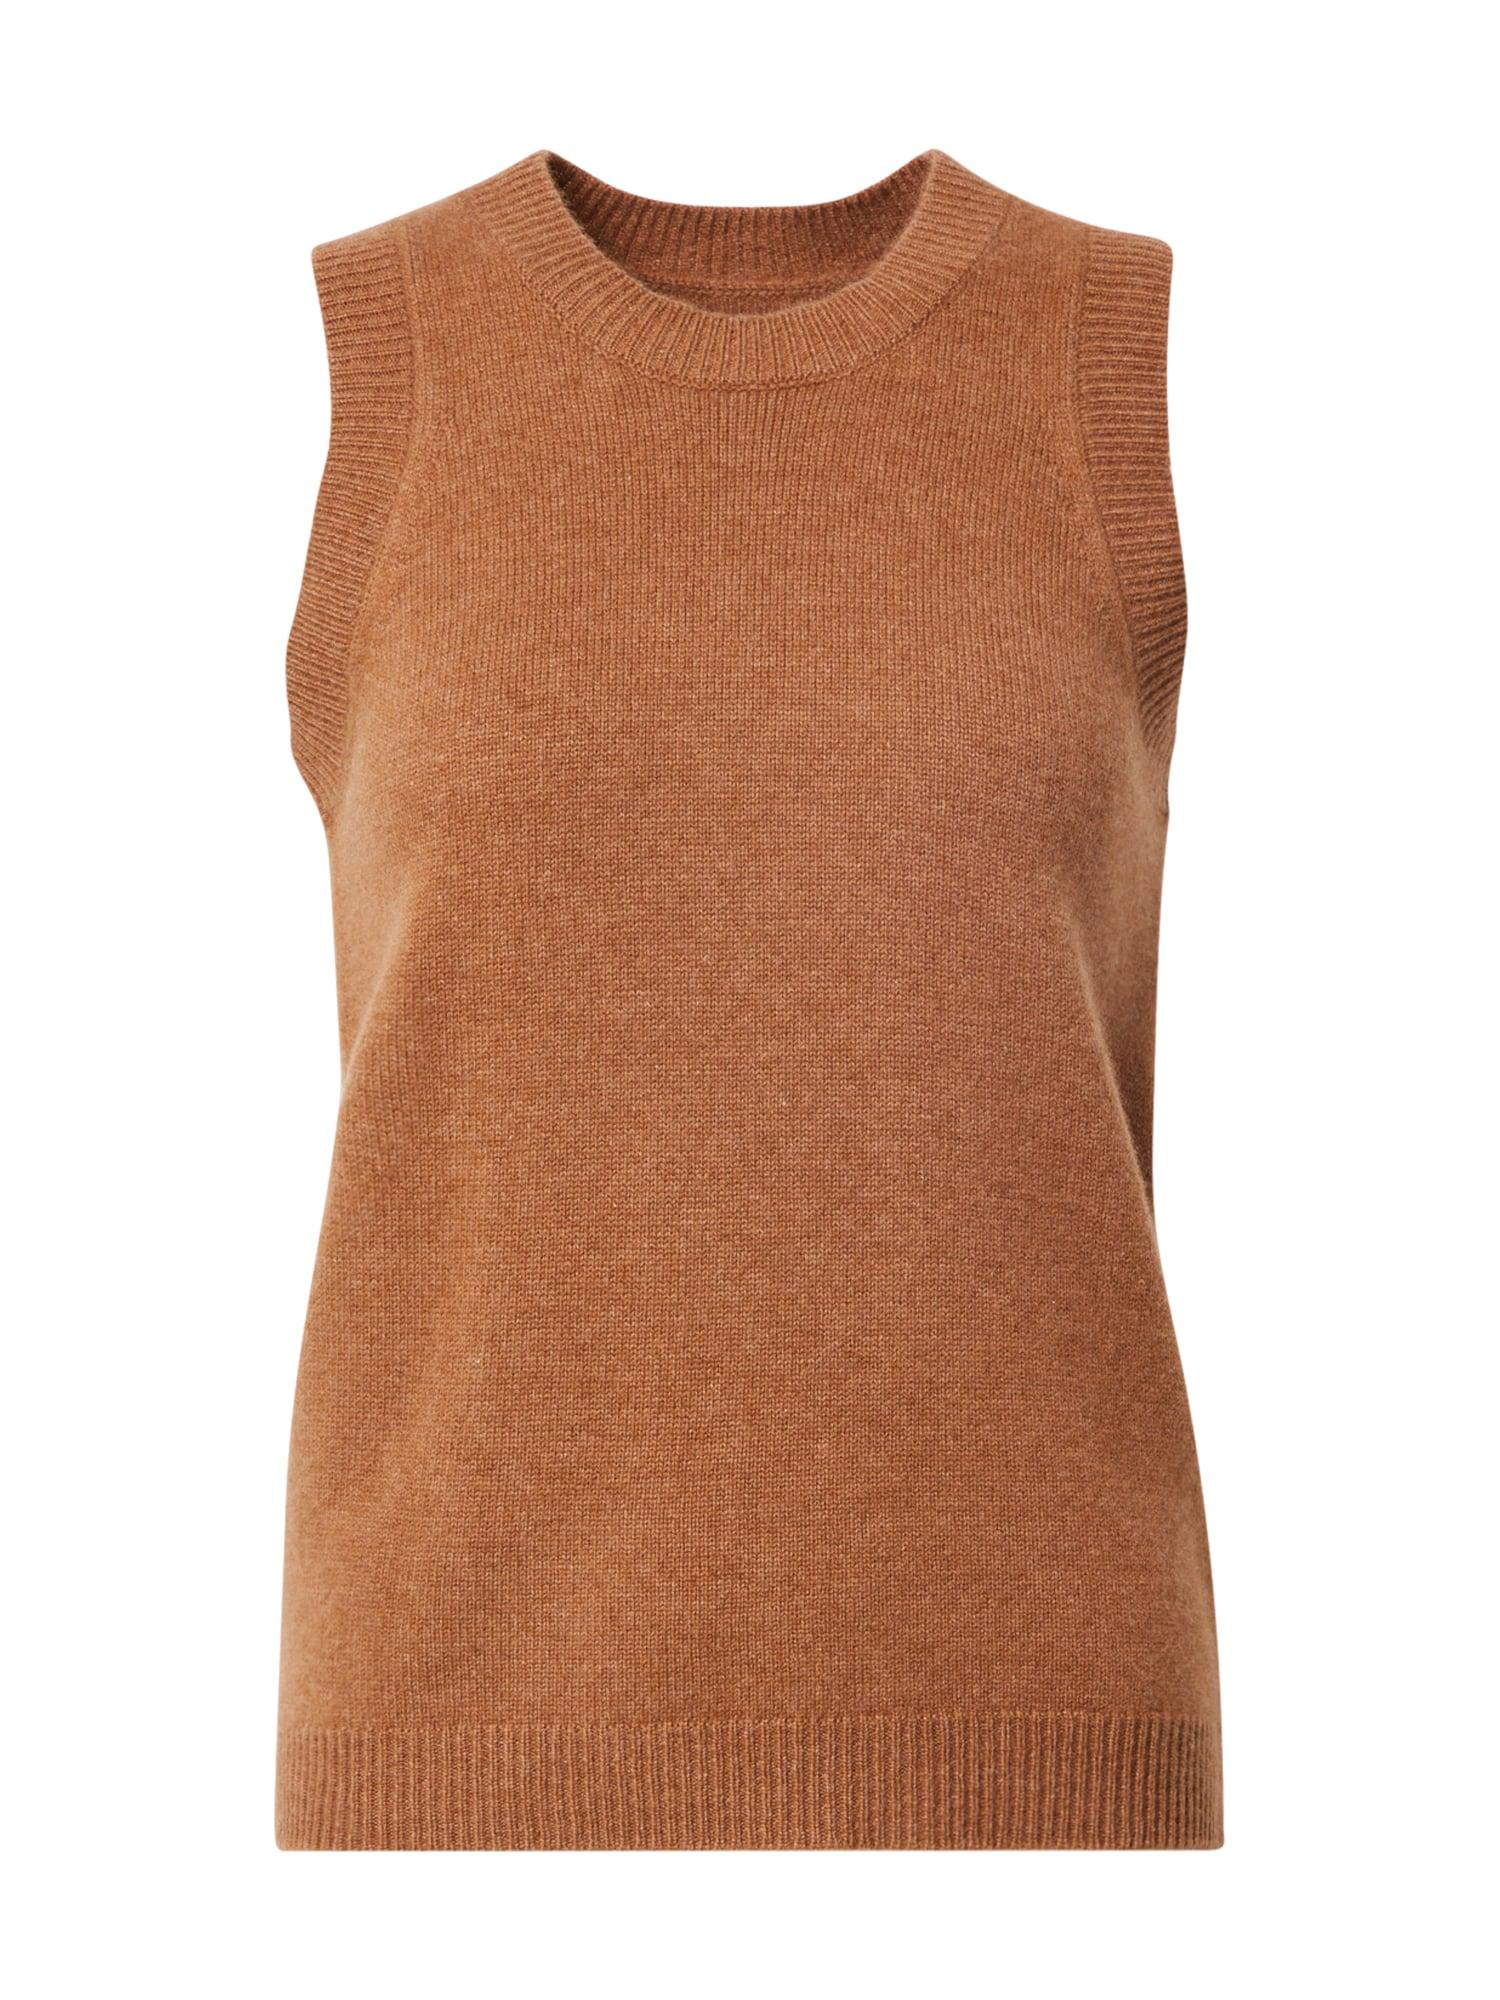 2NDDAY Megztinis 'Layton' karamelės